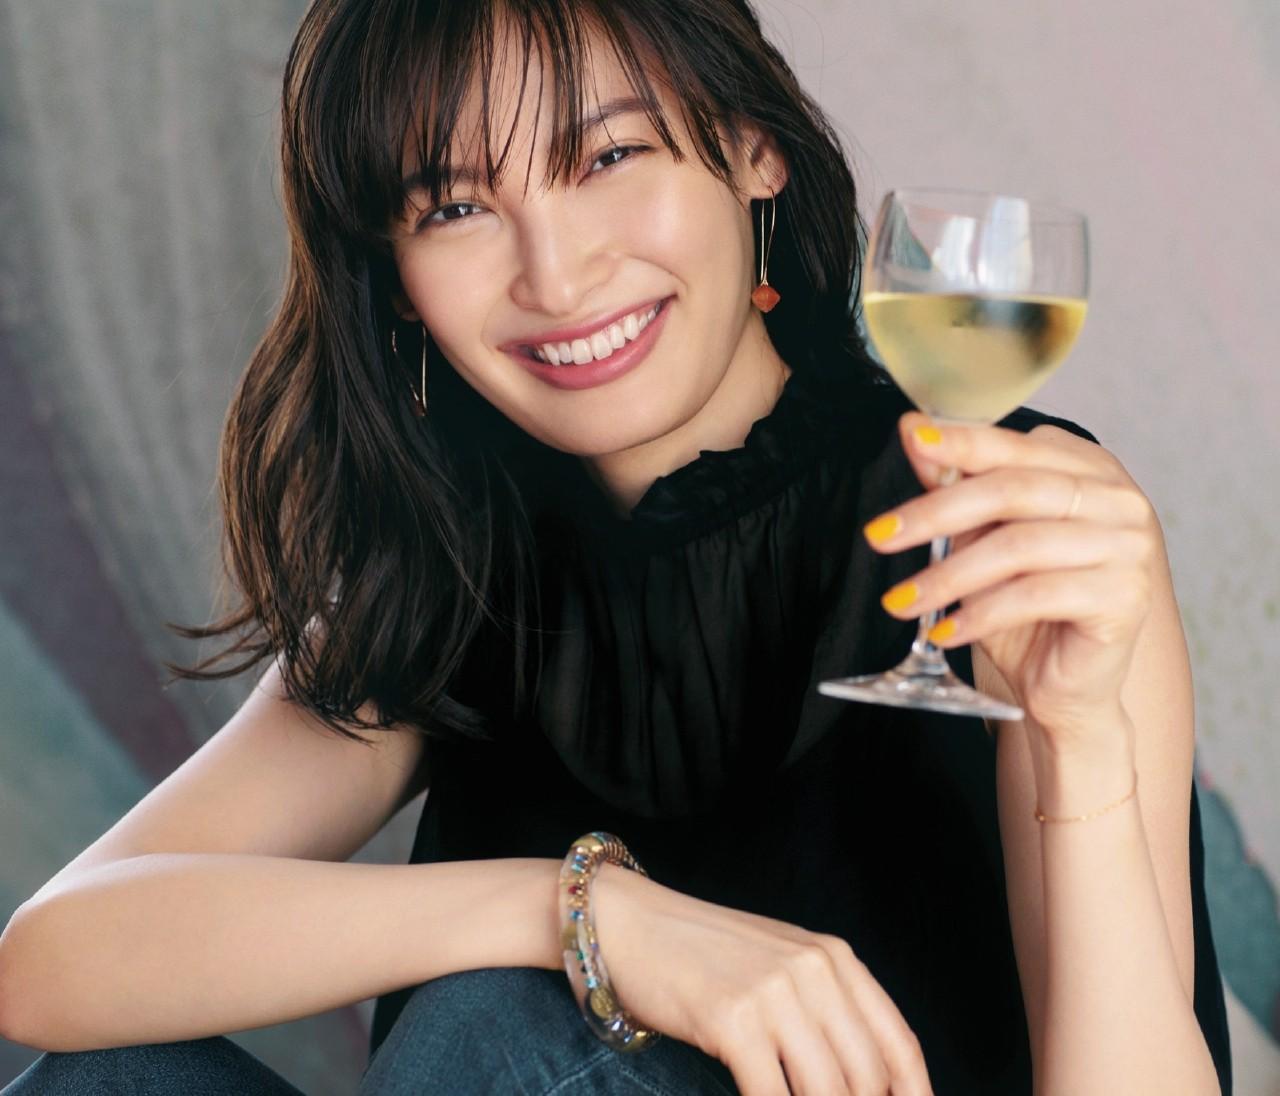 【Zoom映えアクセサリー】オンライン飲み会は色石アクセで華やかさを